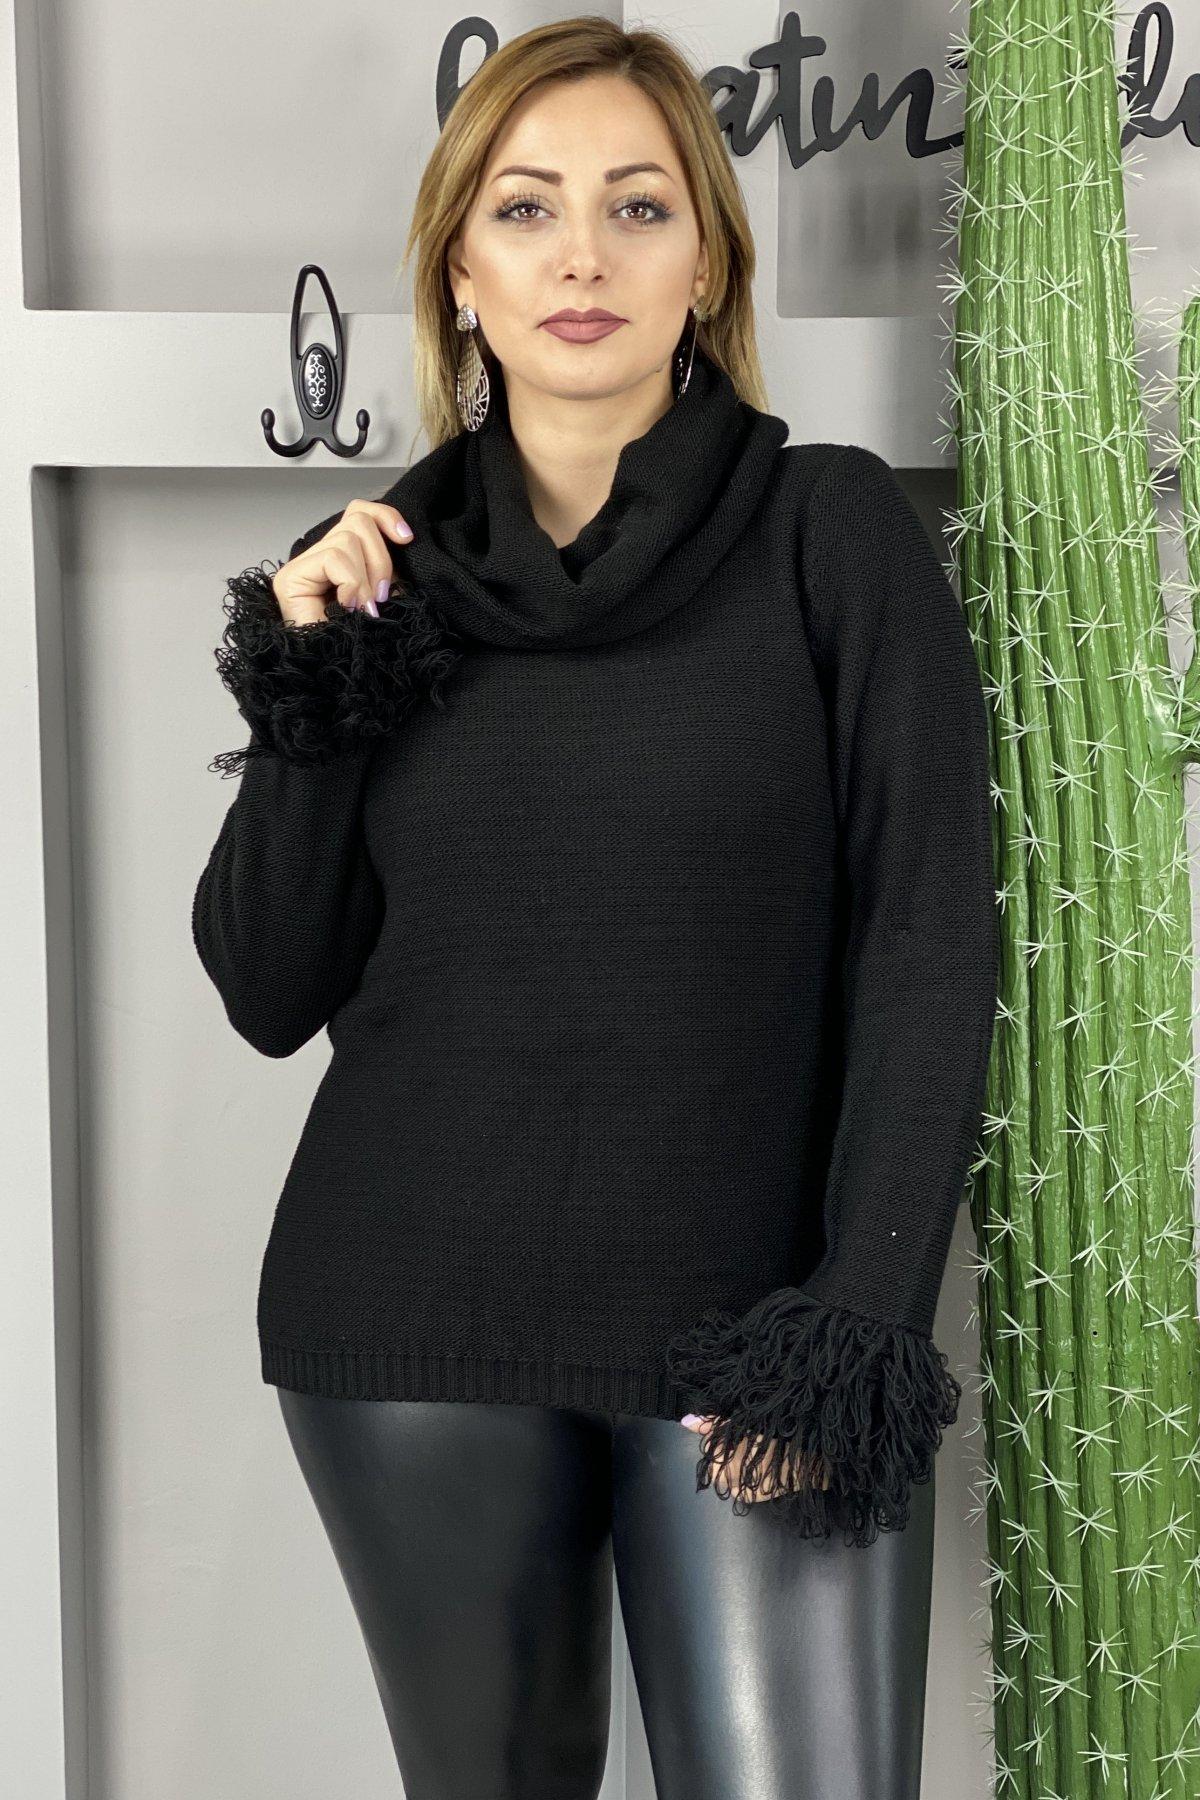 https://resim.chicbag.com.tr/chb113701/syh/1163-kollari-puskul-ip-degaje-yaka-harosa-kazak-01129ec8bd65.jpg